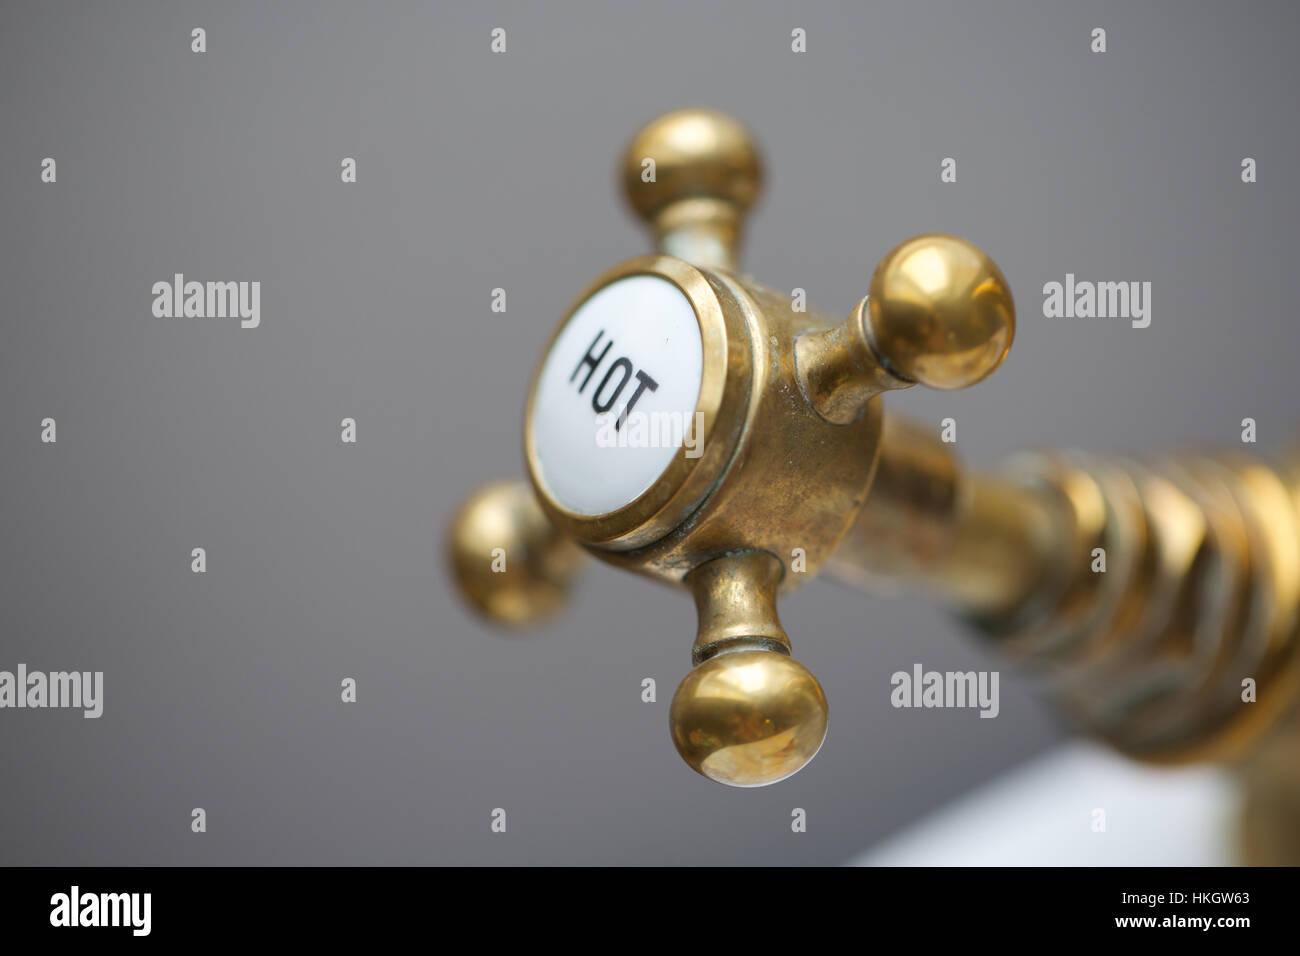 close up of hot water tap. faucet, tap, design, metal. - Stock Image